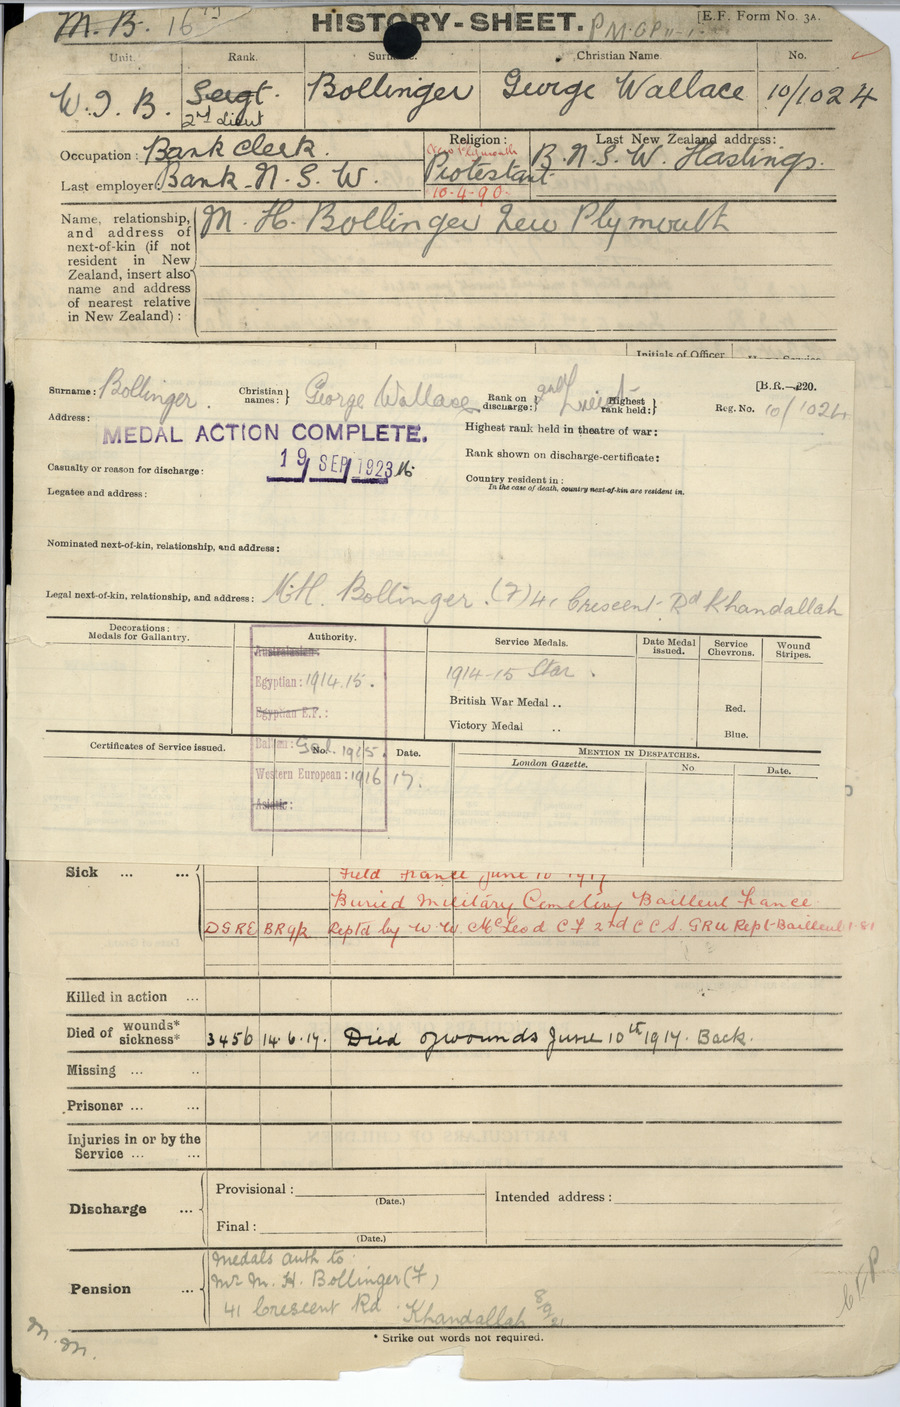 Bollinger GW History Sheet